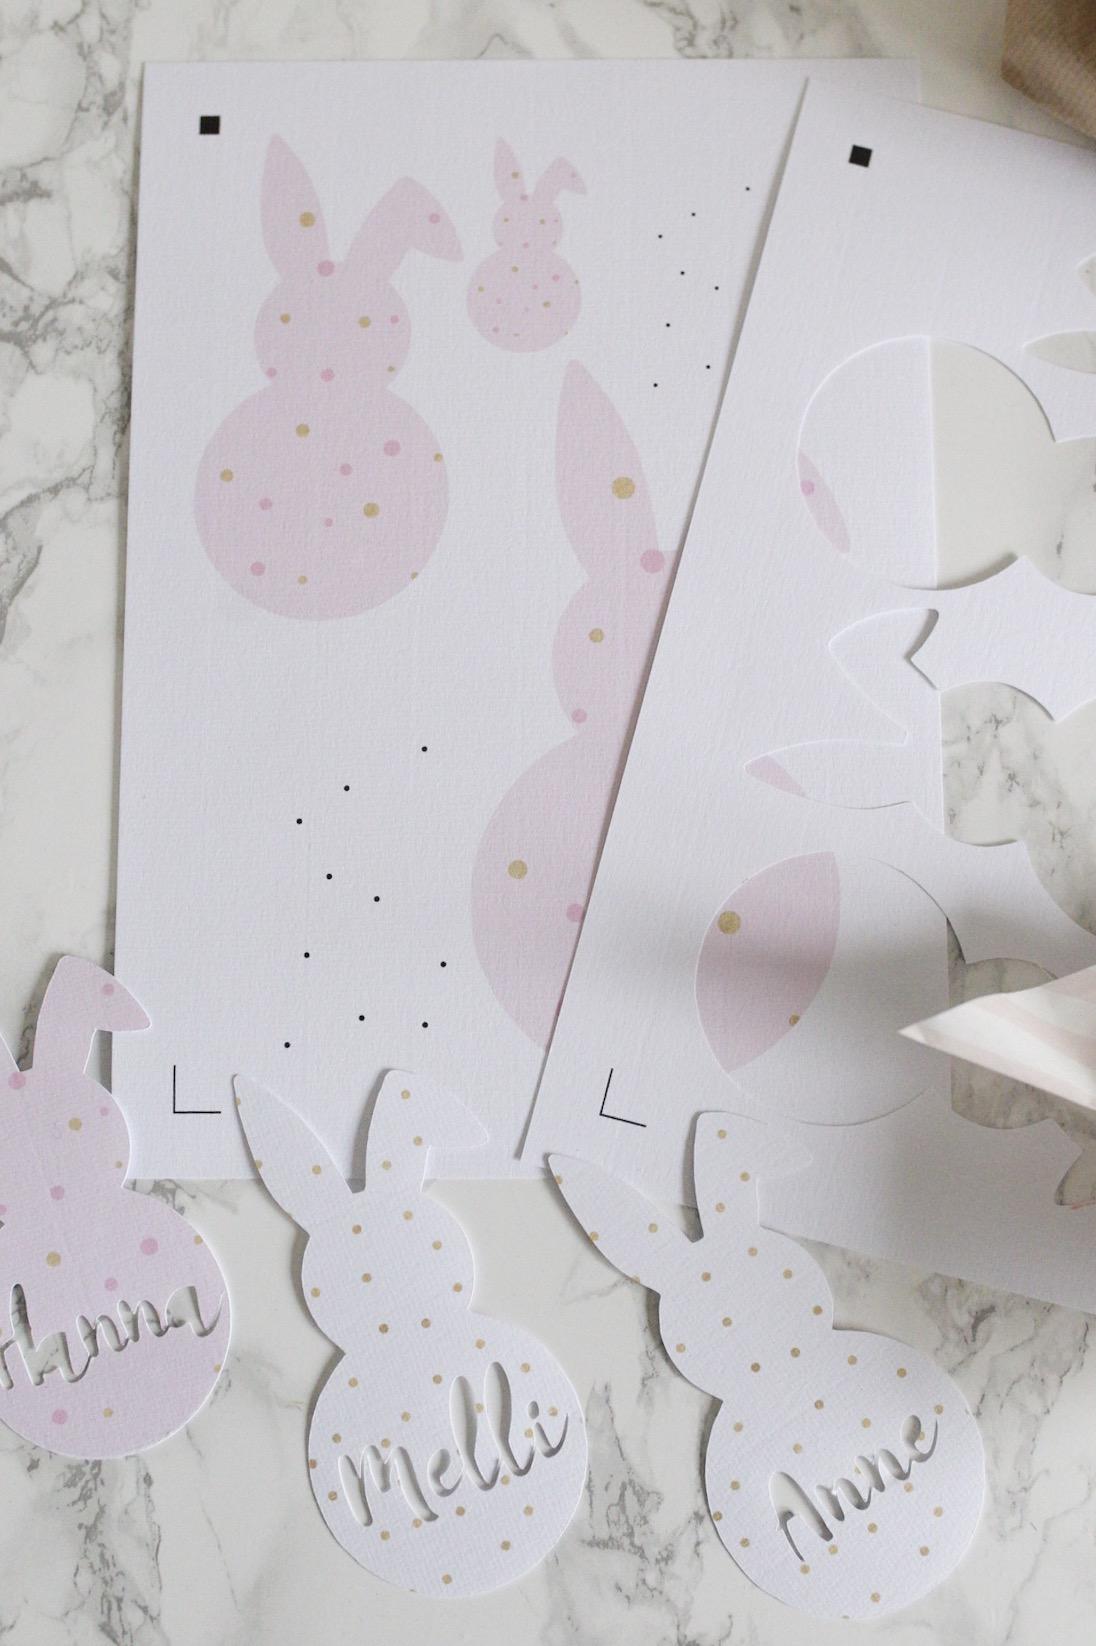 Print and Cut mit dem SILHOUETTE CAMEO 3 - Tischkarten zu Ostern